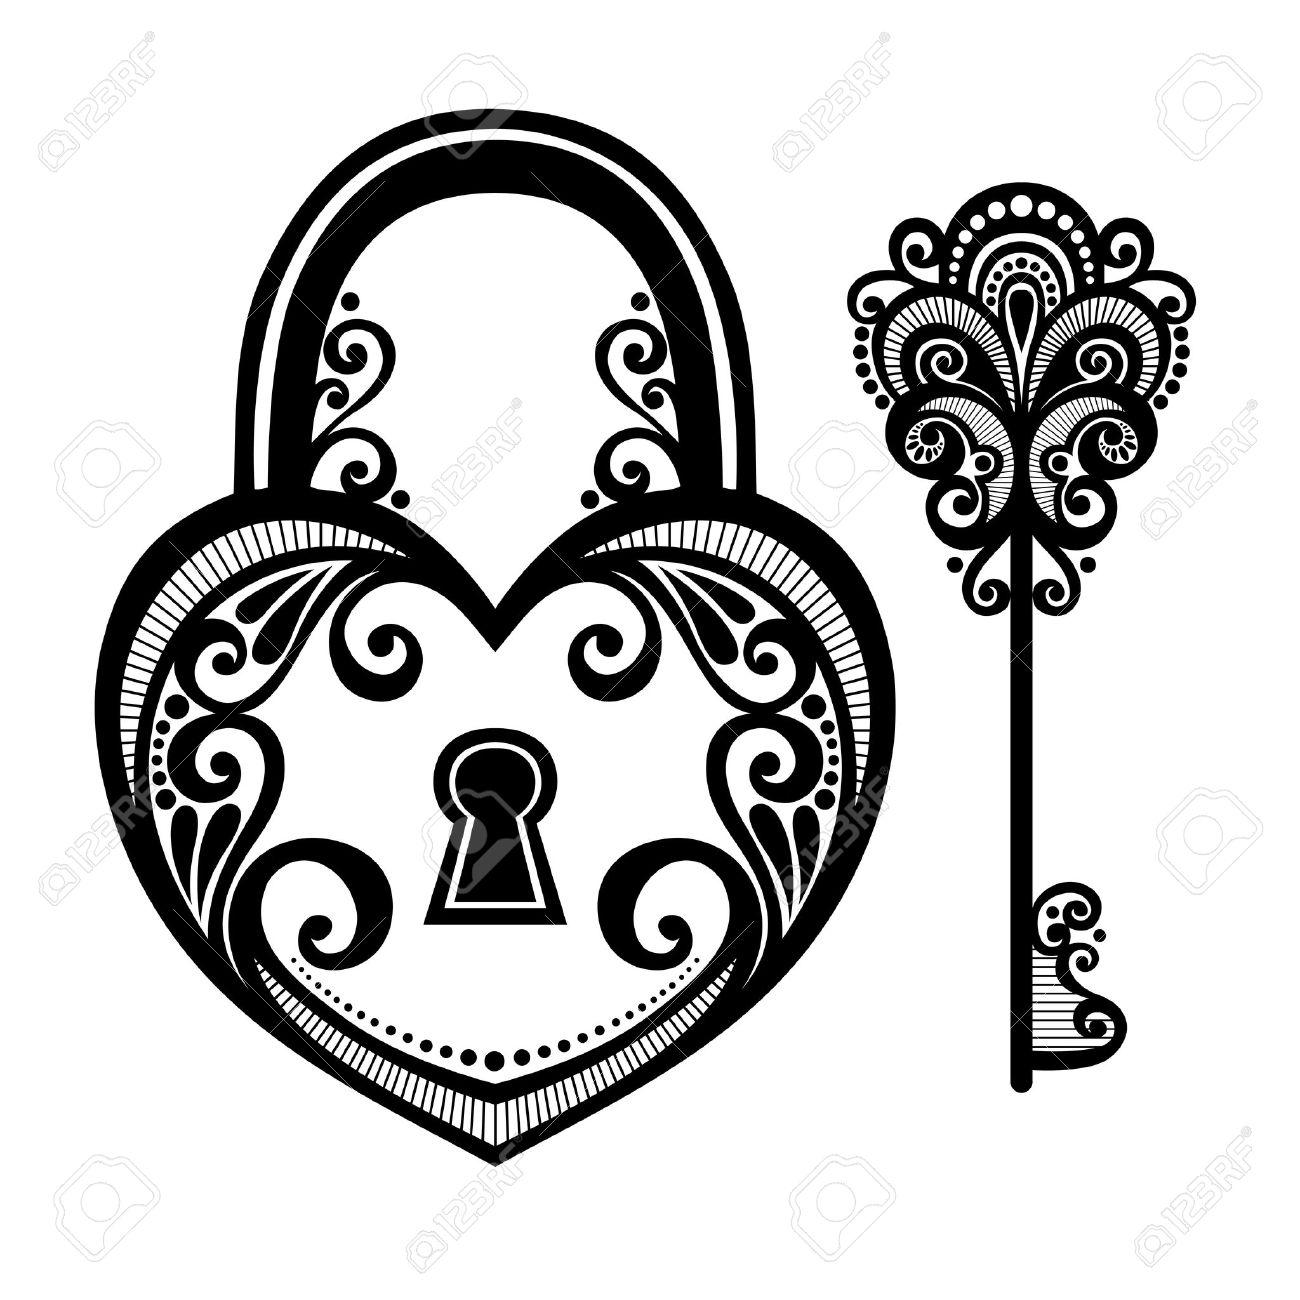 Vector Vintage Lock with a Key - 26617443